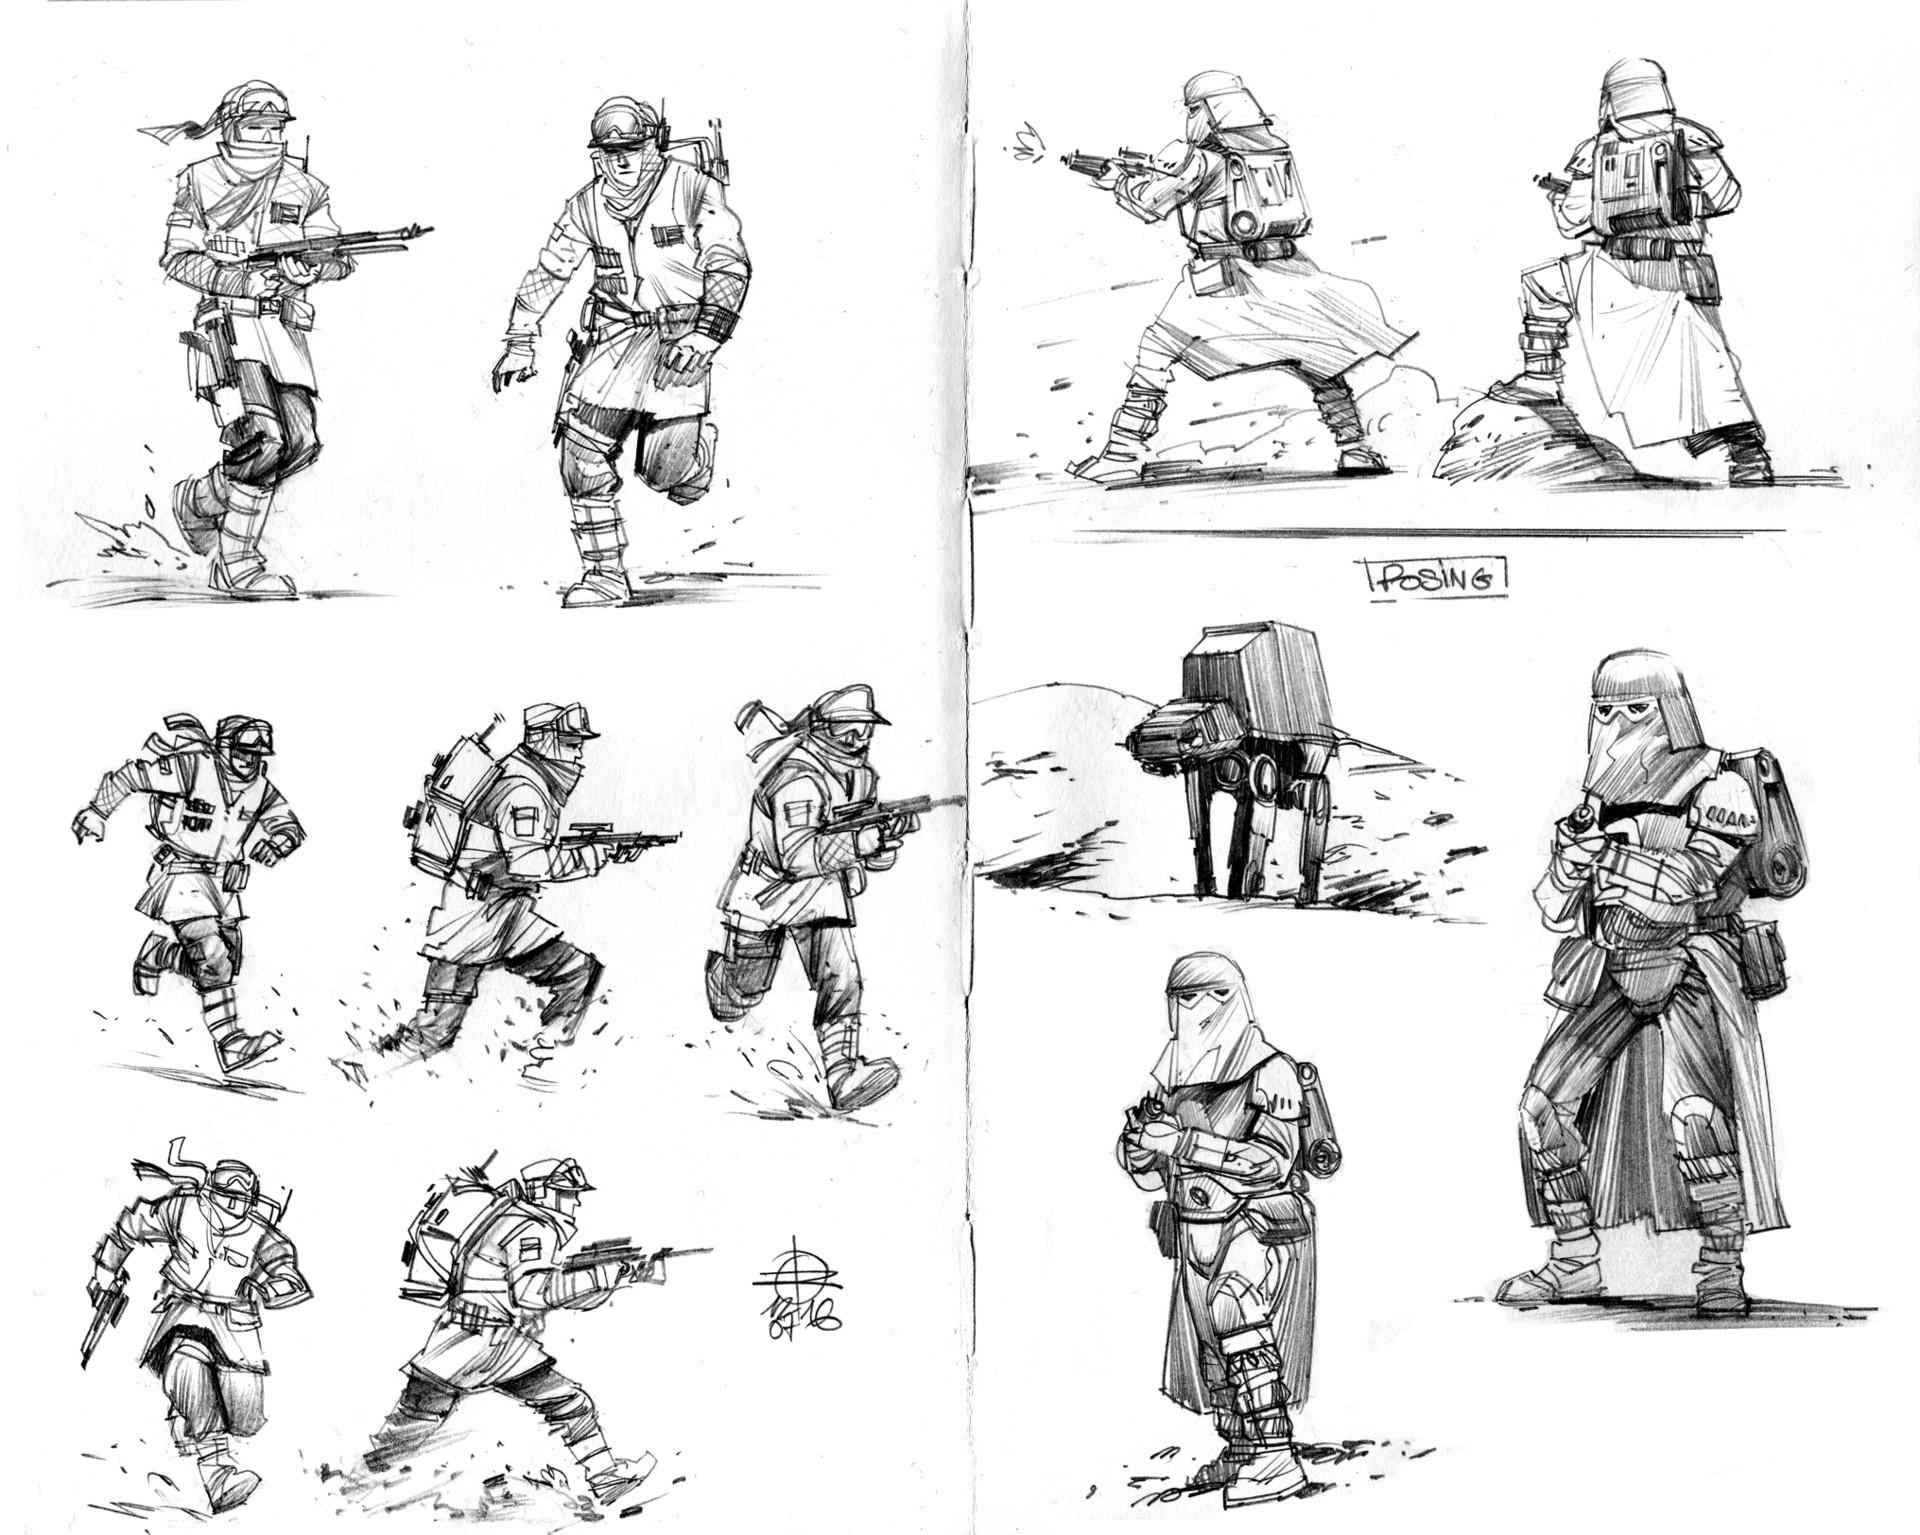 Renaud roche part01 sketches02b